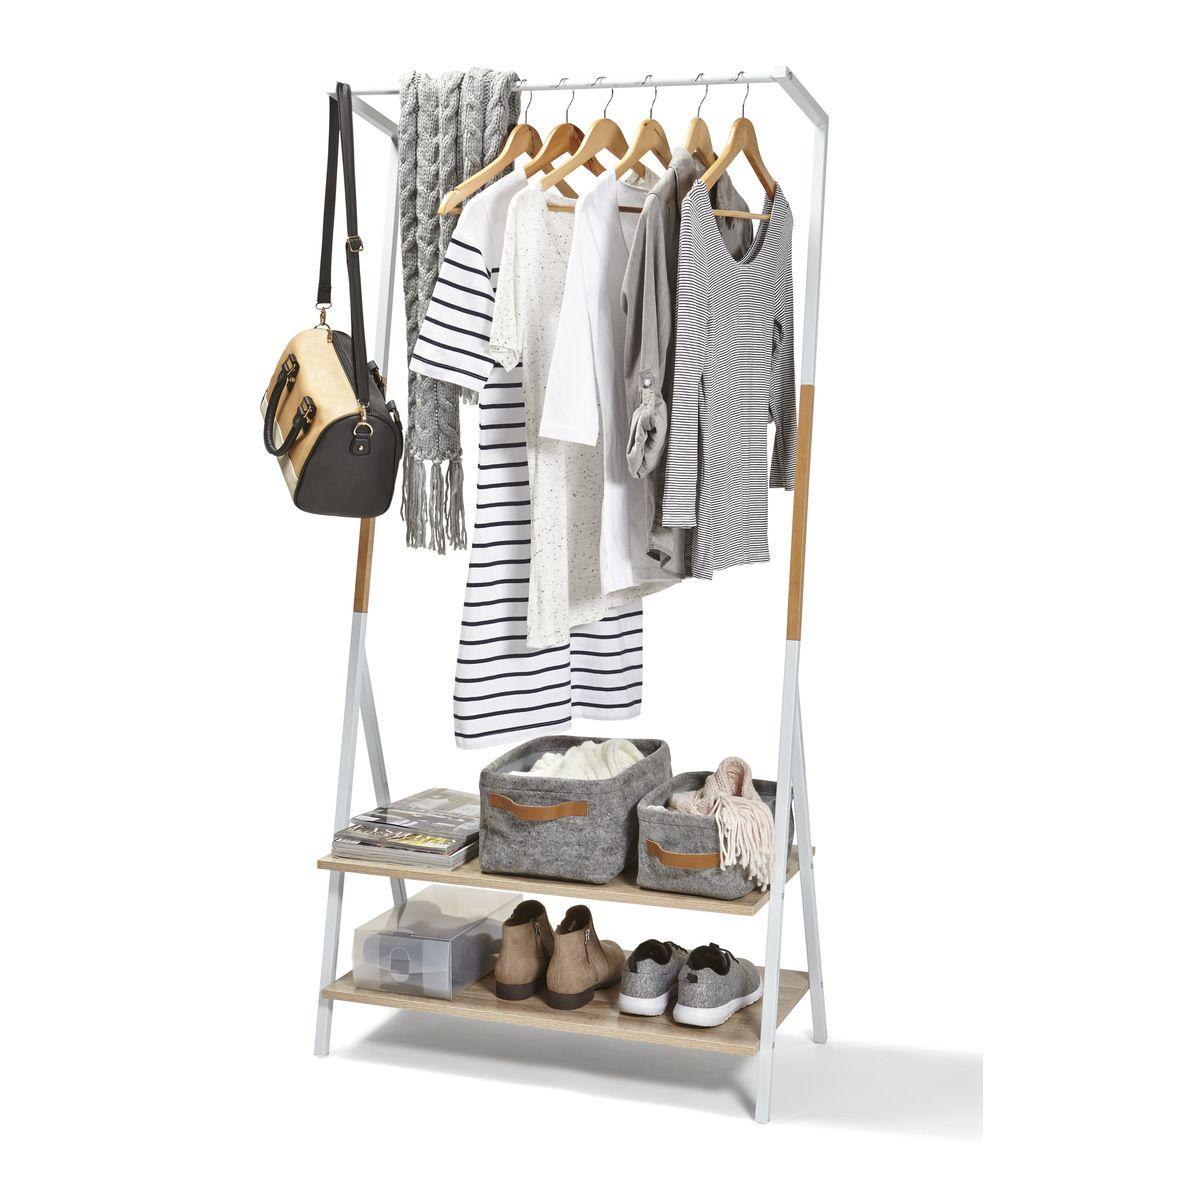 Scandi Garment Rack Clothing Rack Garment Racks Kmart Clothes